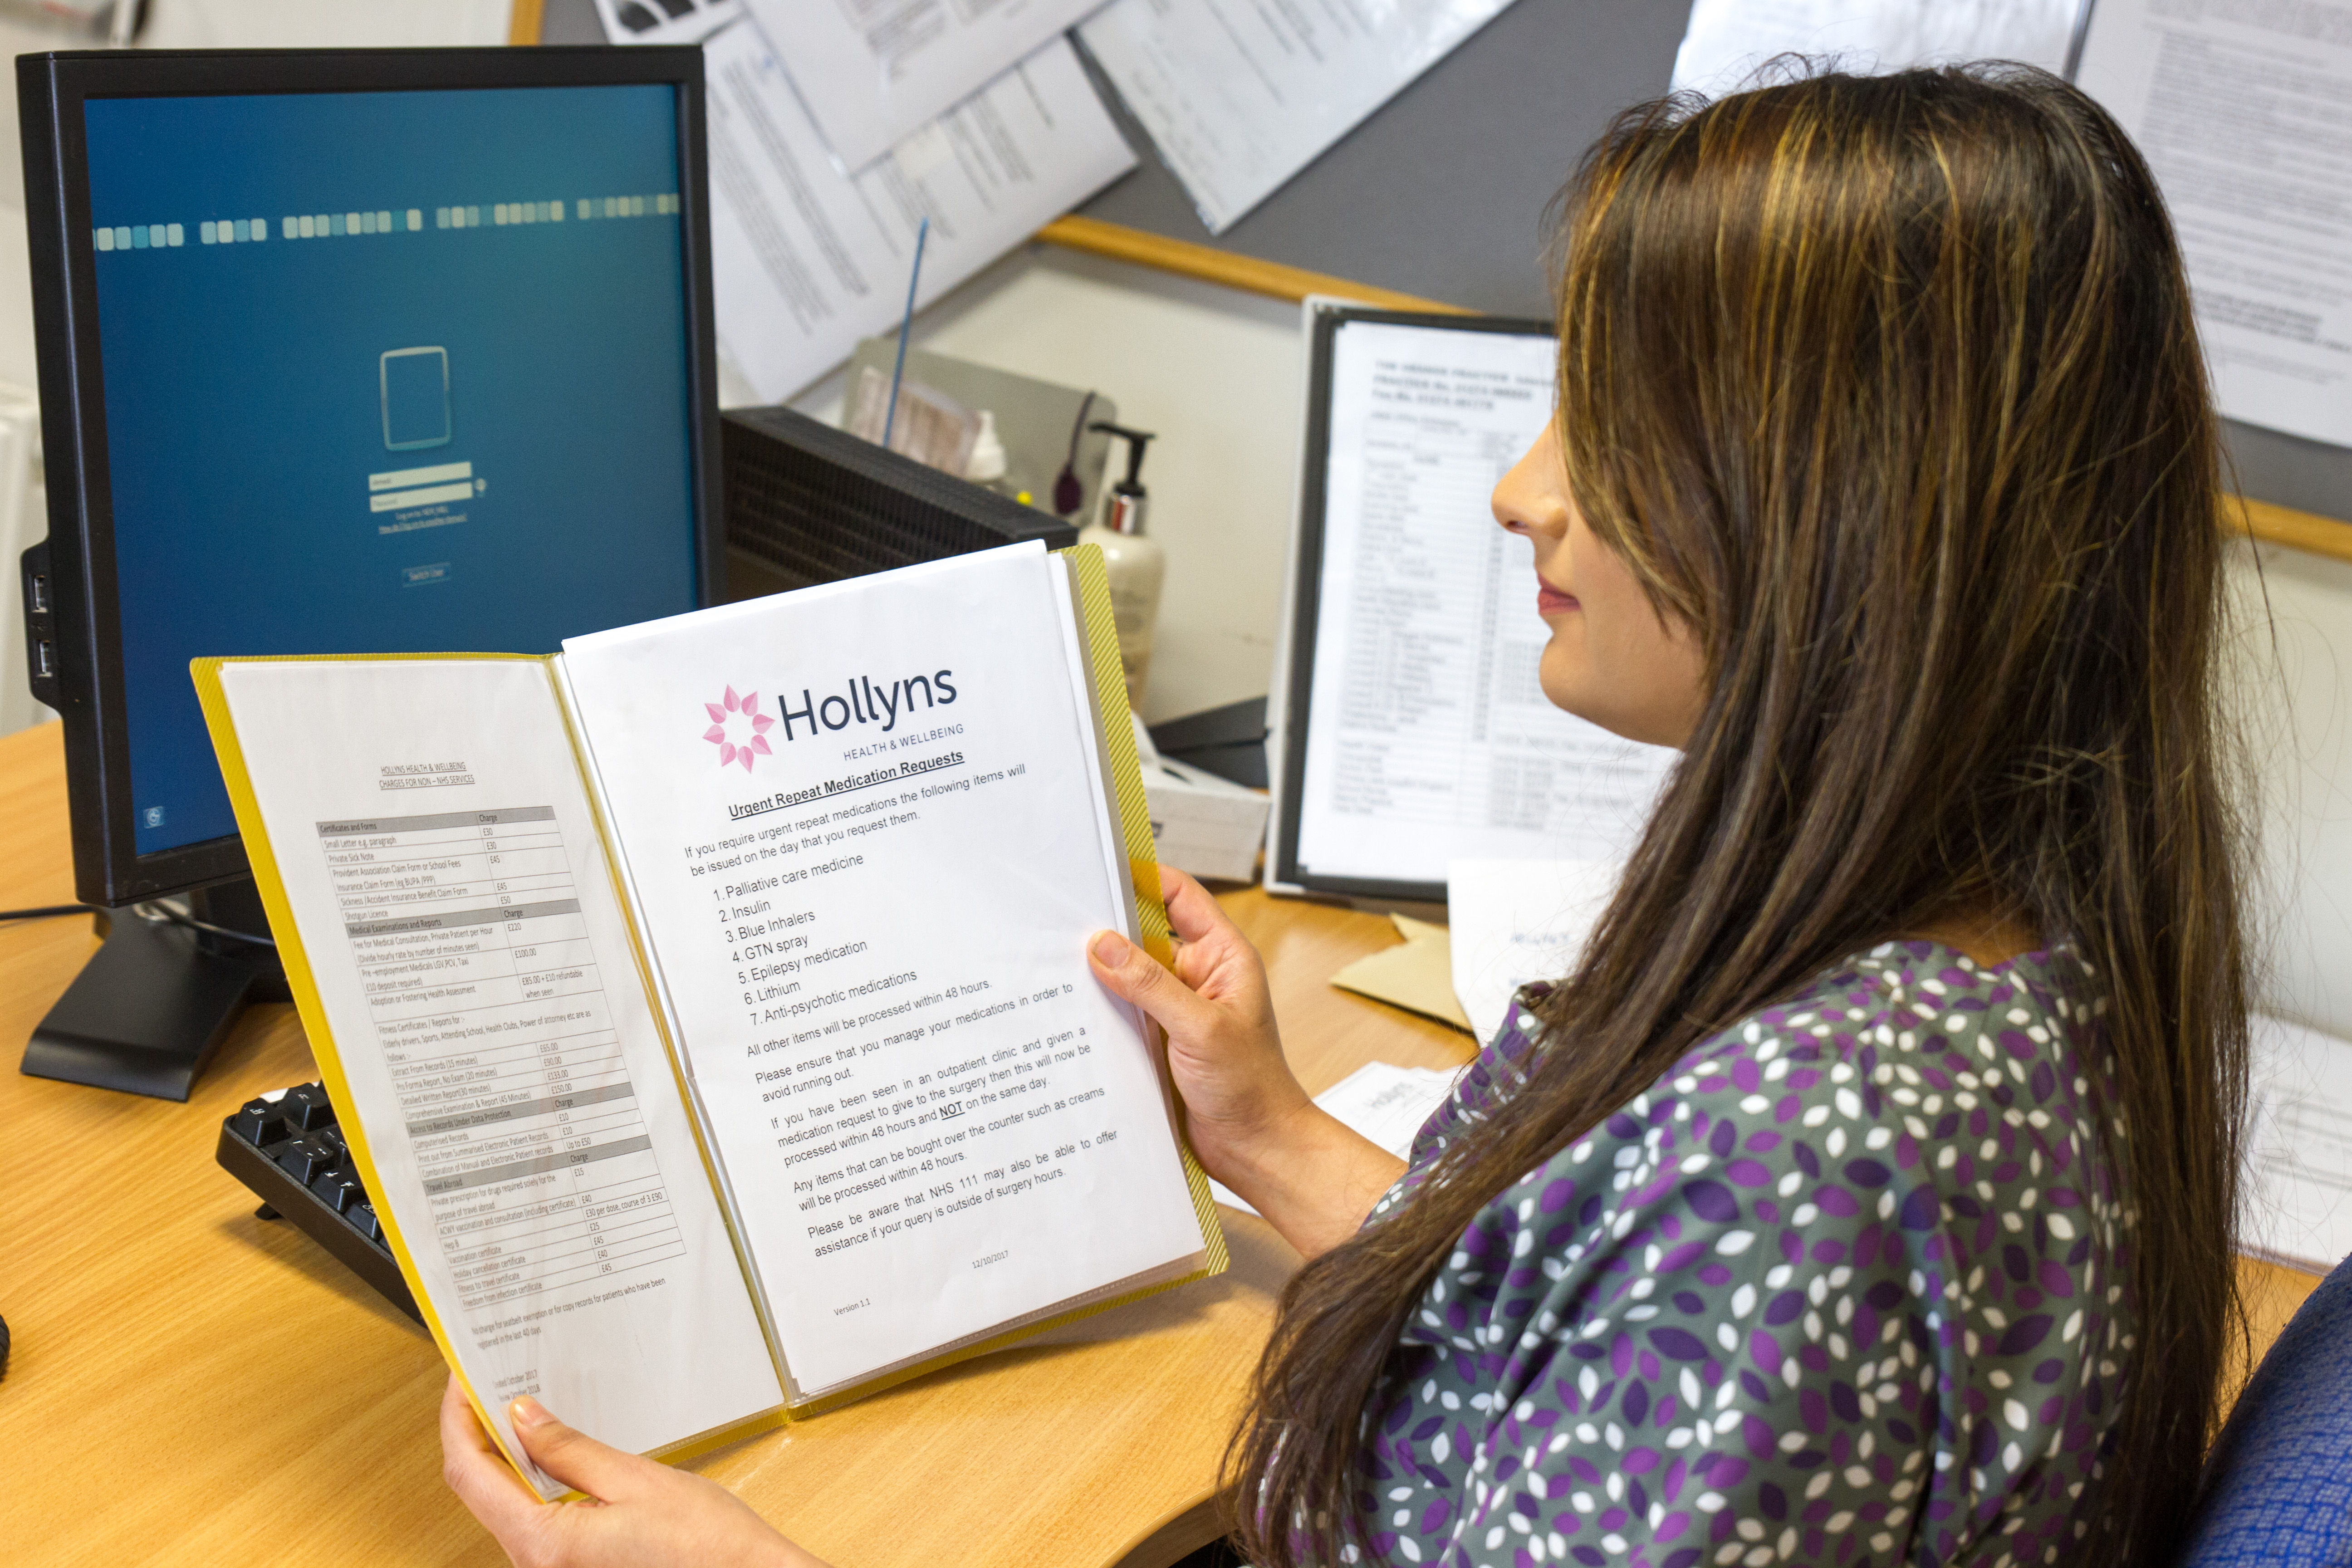 Allerton Admin Worker 4 Hollyns Health Wellbeing